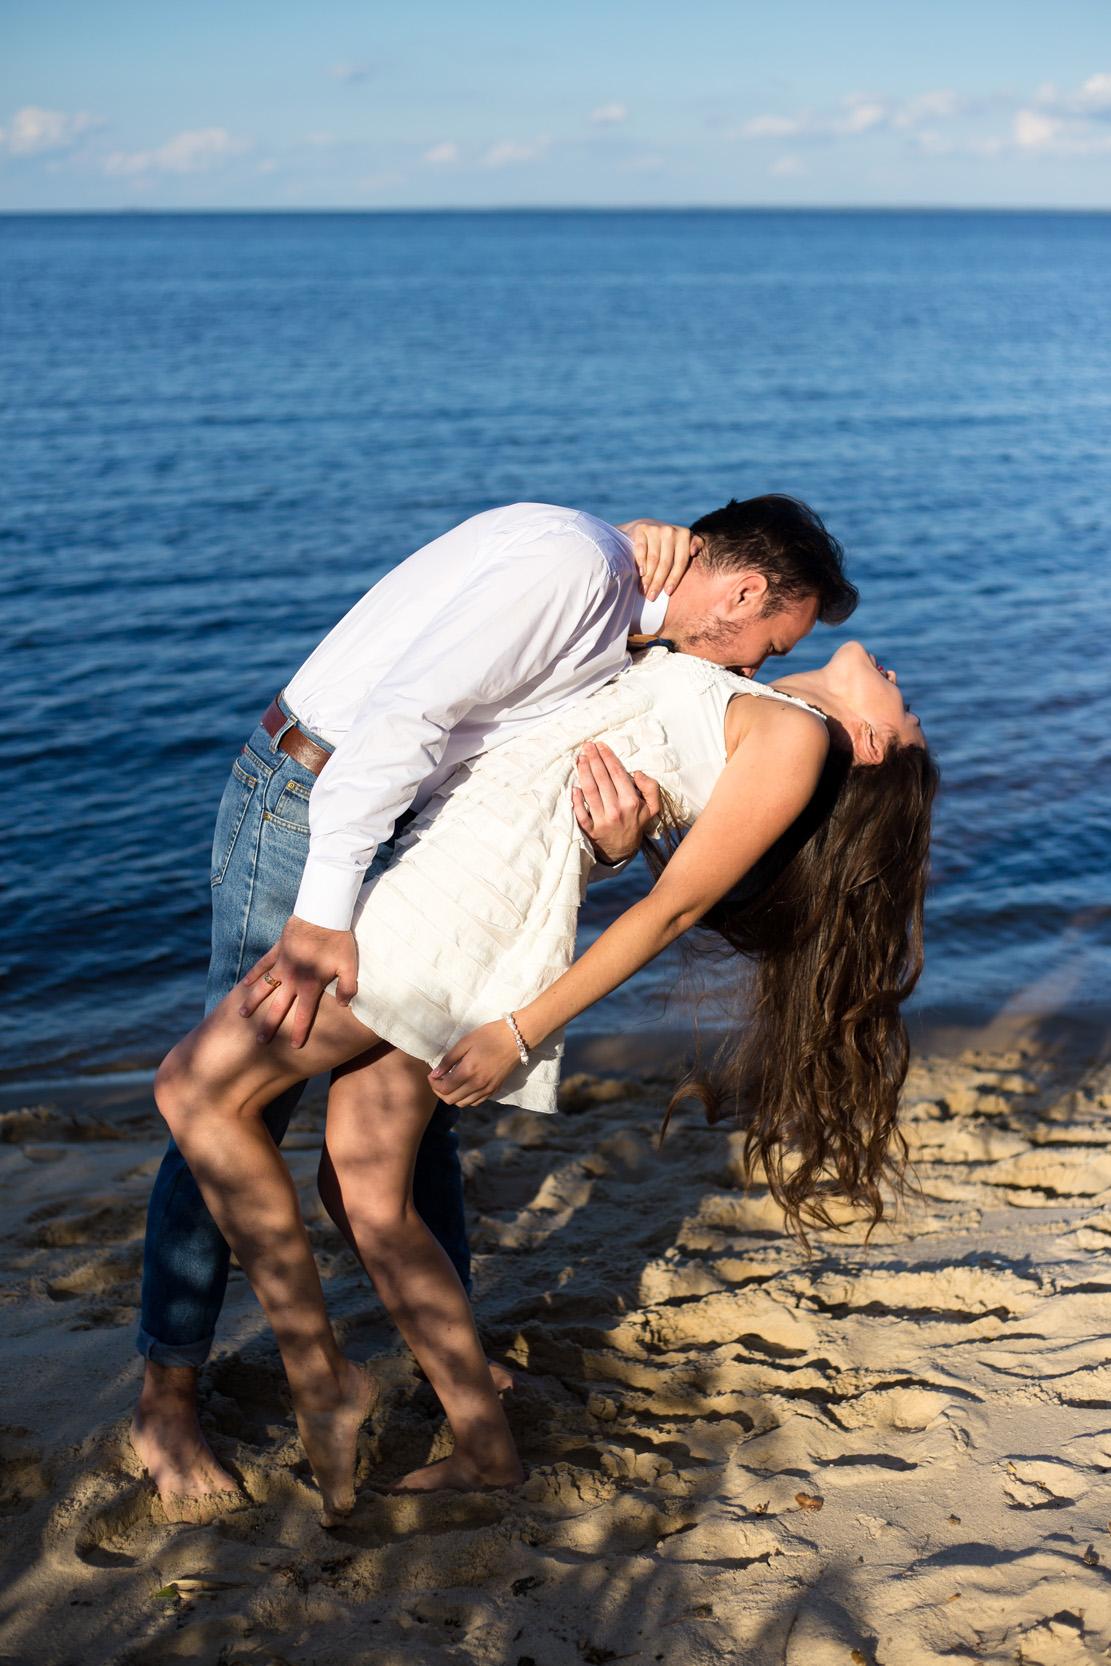 Лавстори на берегу моря, влюбленная пара на берегу моря, прогулка по песку